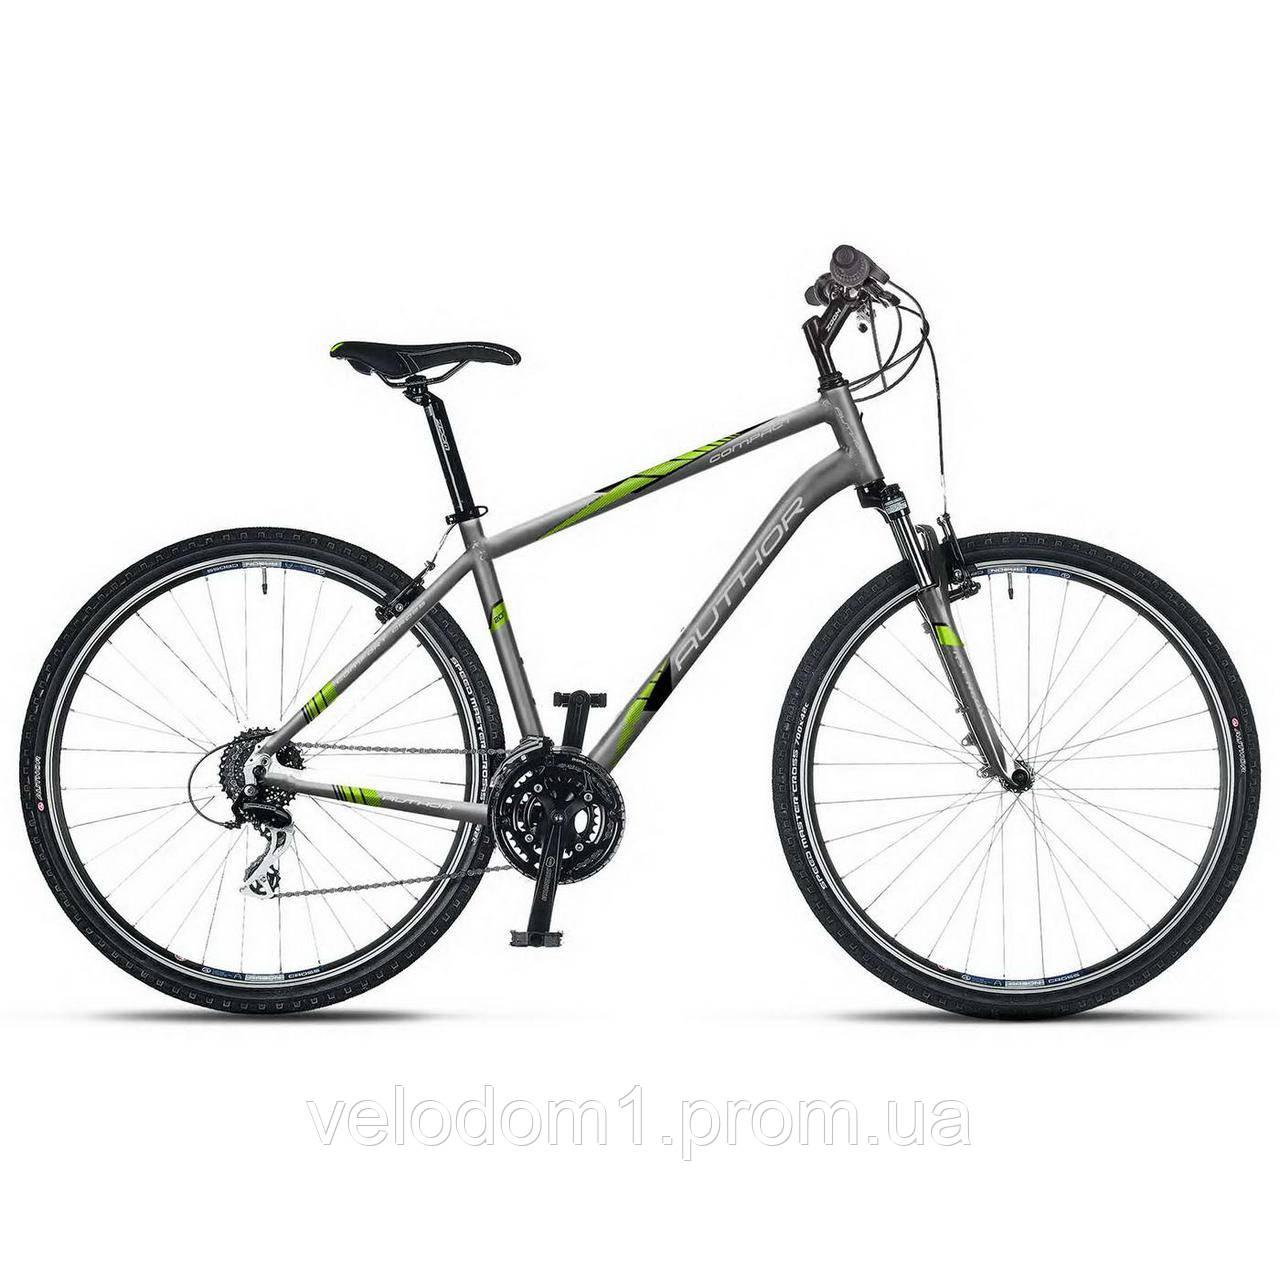 "Велосипед Author 28"" Compact 20 серый (2018)"